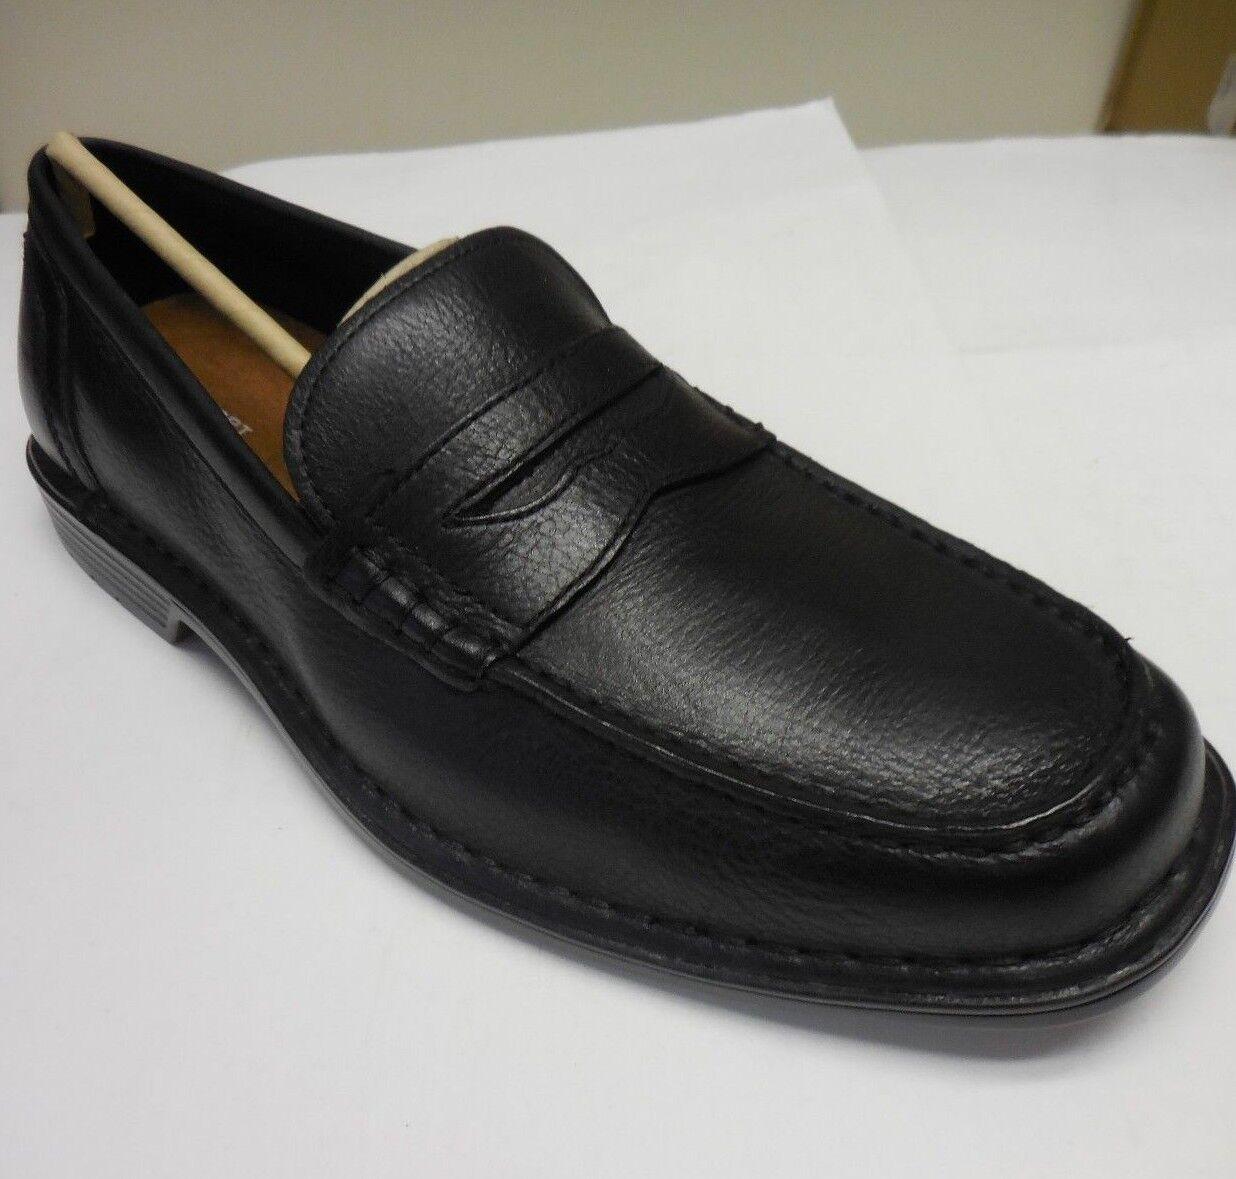 Rockport Men's Ws Penny Black Leather Slip-On Dress shoes Size 11.5 M